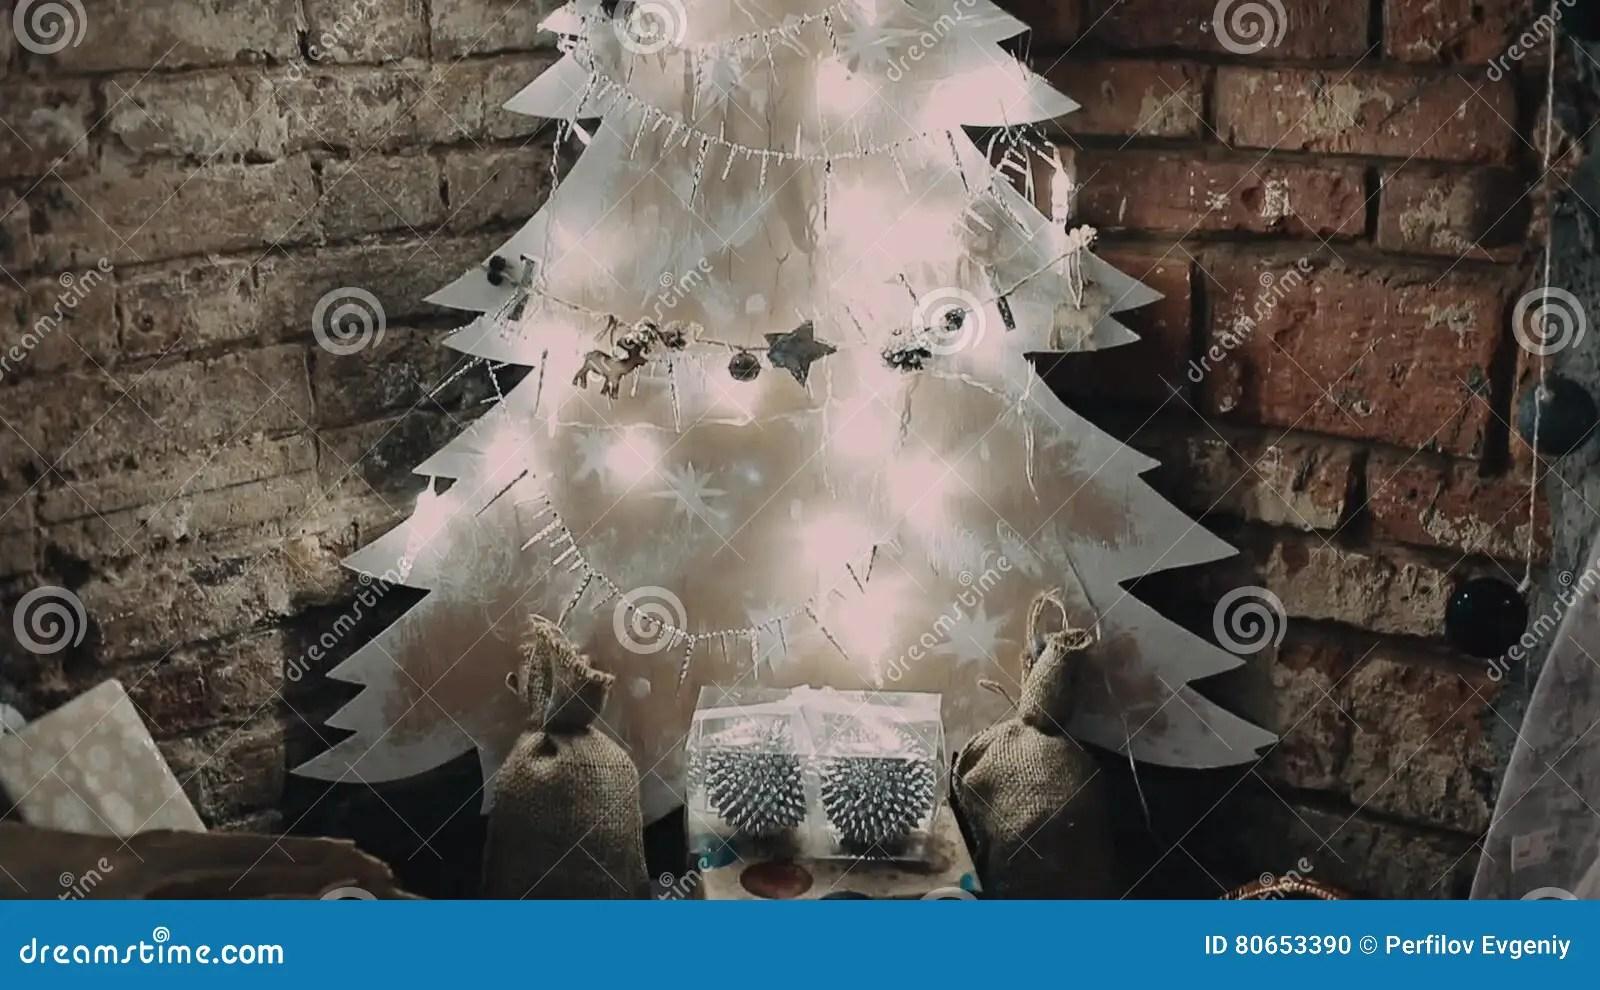 farmhouse kitchen faucet bosch 浆果装饰霍莉家留给槲寄生多雪的结构树白色冬天圣诞节土气内部农舍装饰 浆果装饰霍莉家留给槲寄生多雪的结构树白色冬天圣诞节土气内部农舍装饰影视素材 视频包括有居住 房子 80653390